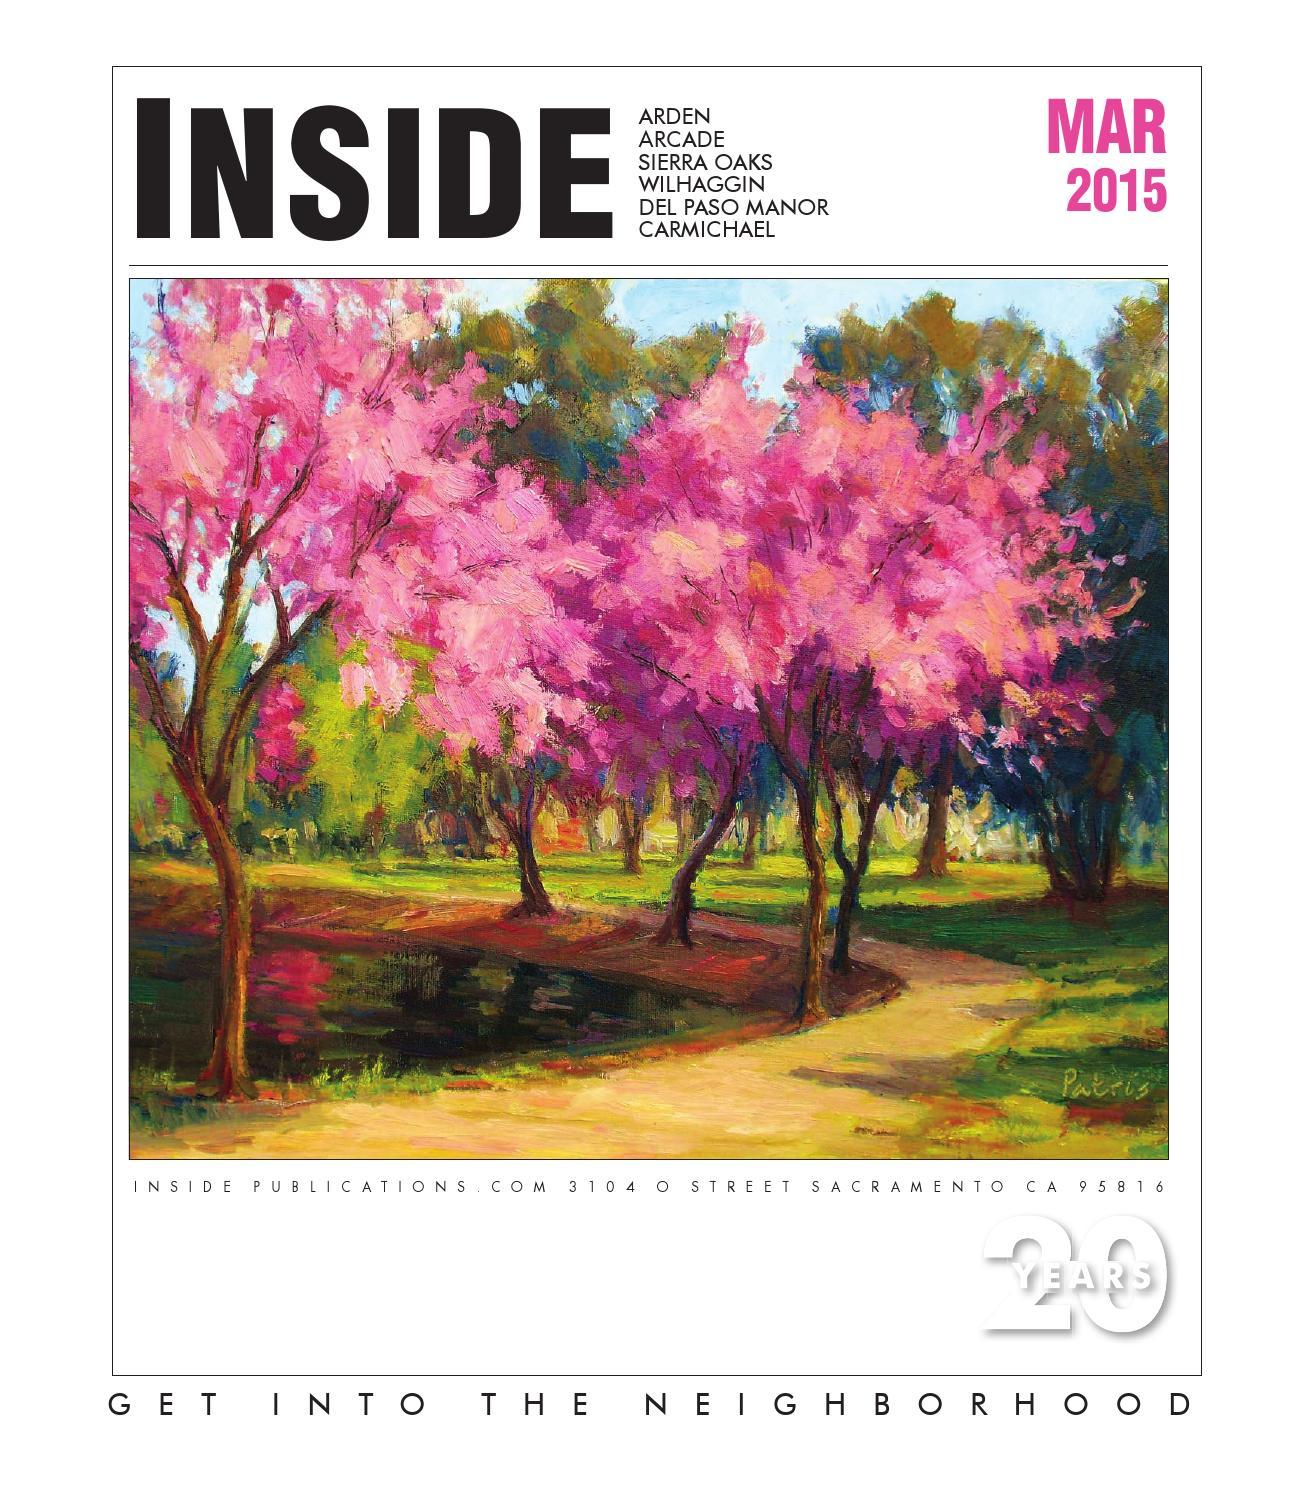 Inside arden mar 2015 by Inside Publications - issuu